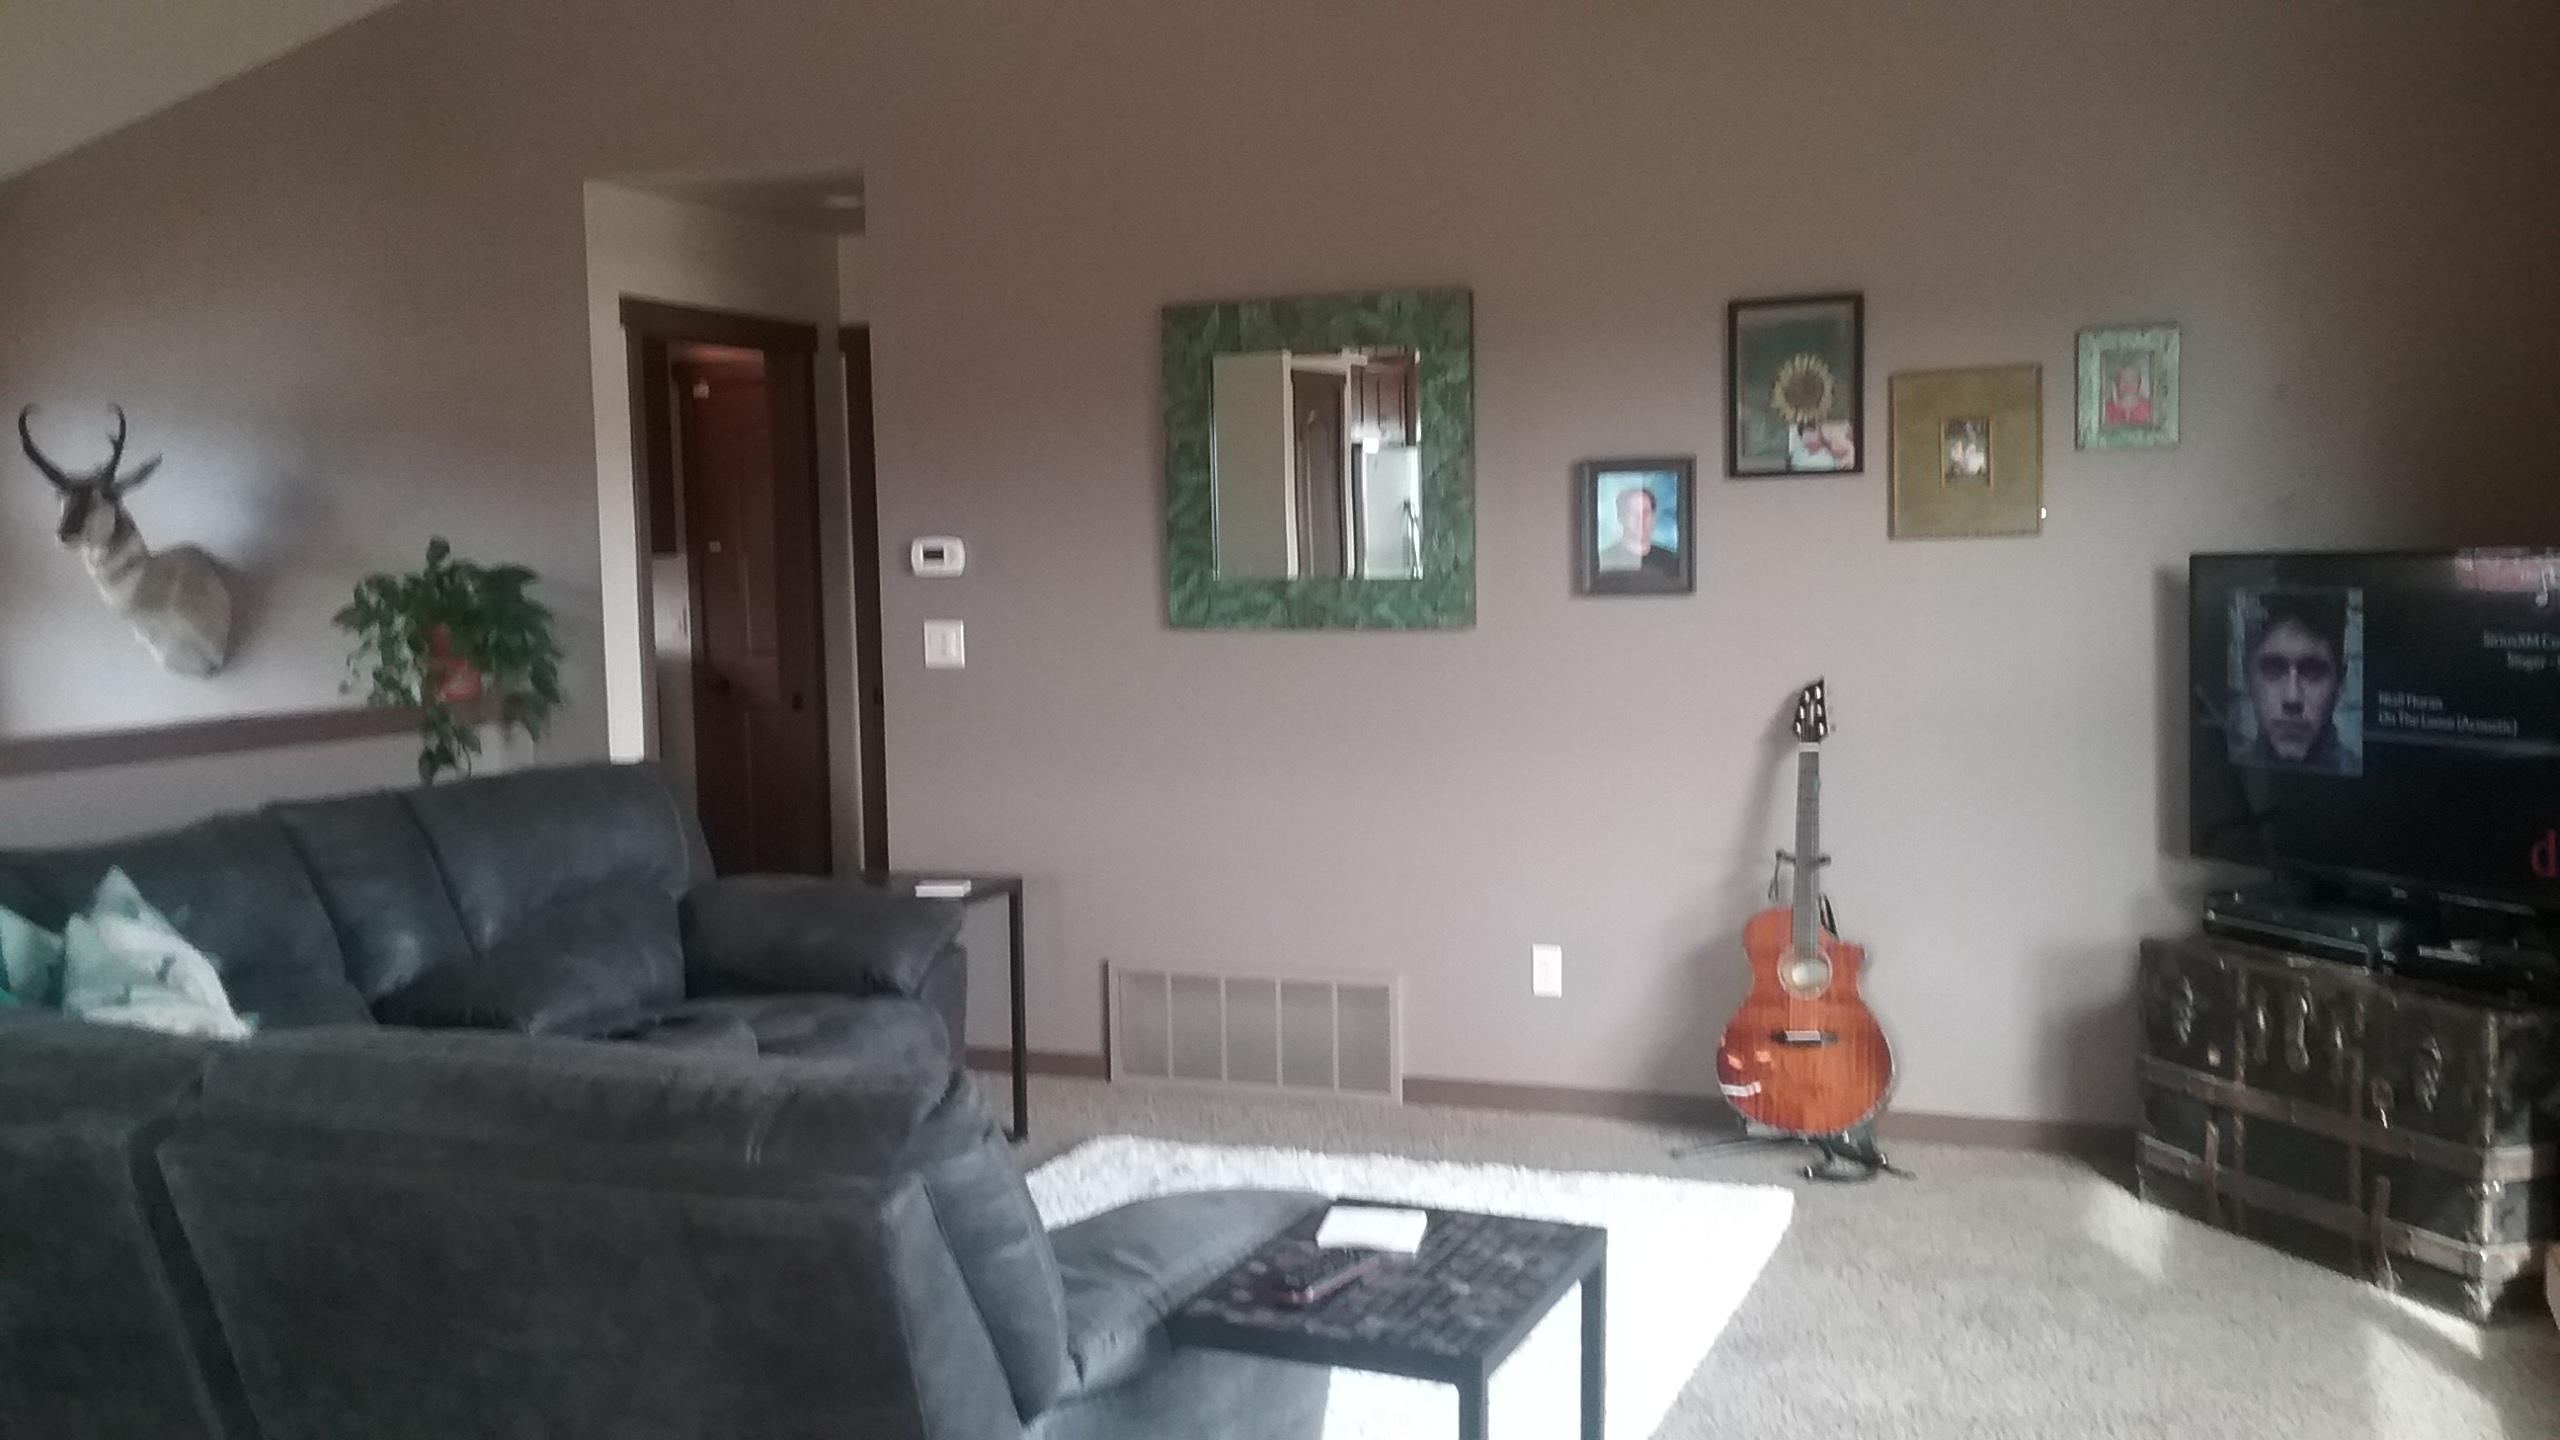 444 livingroom 1